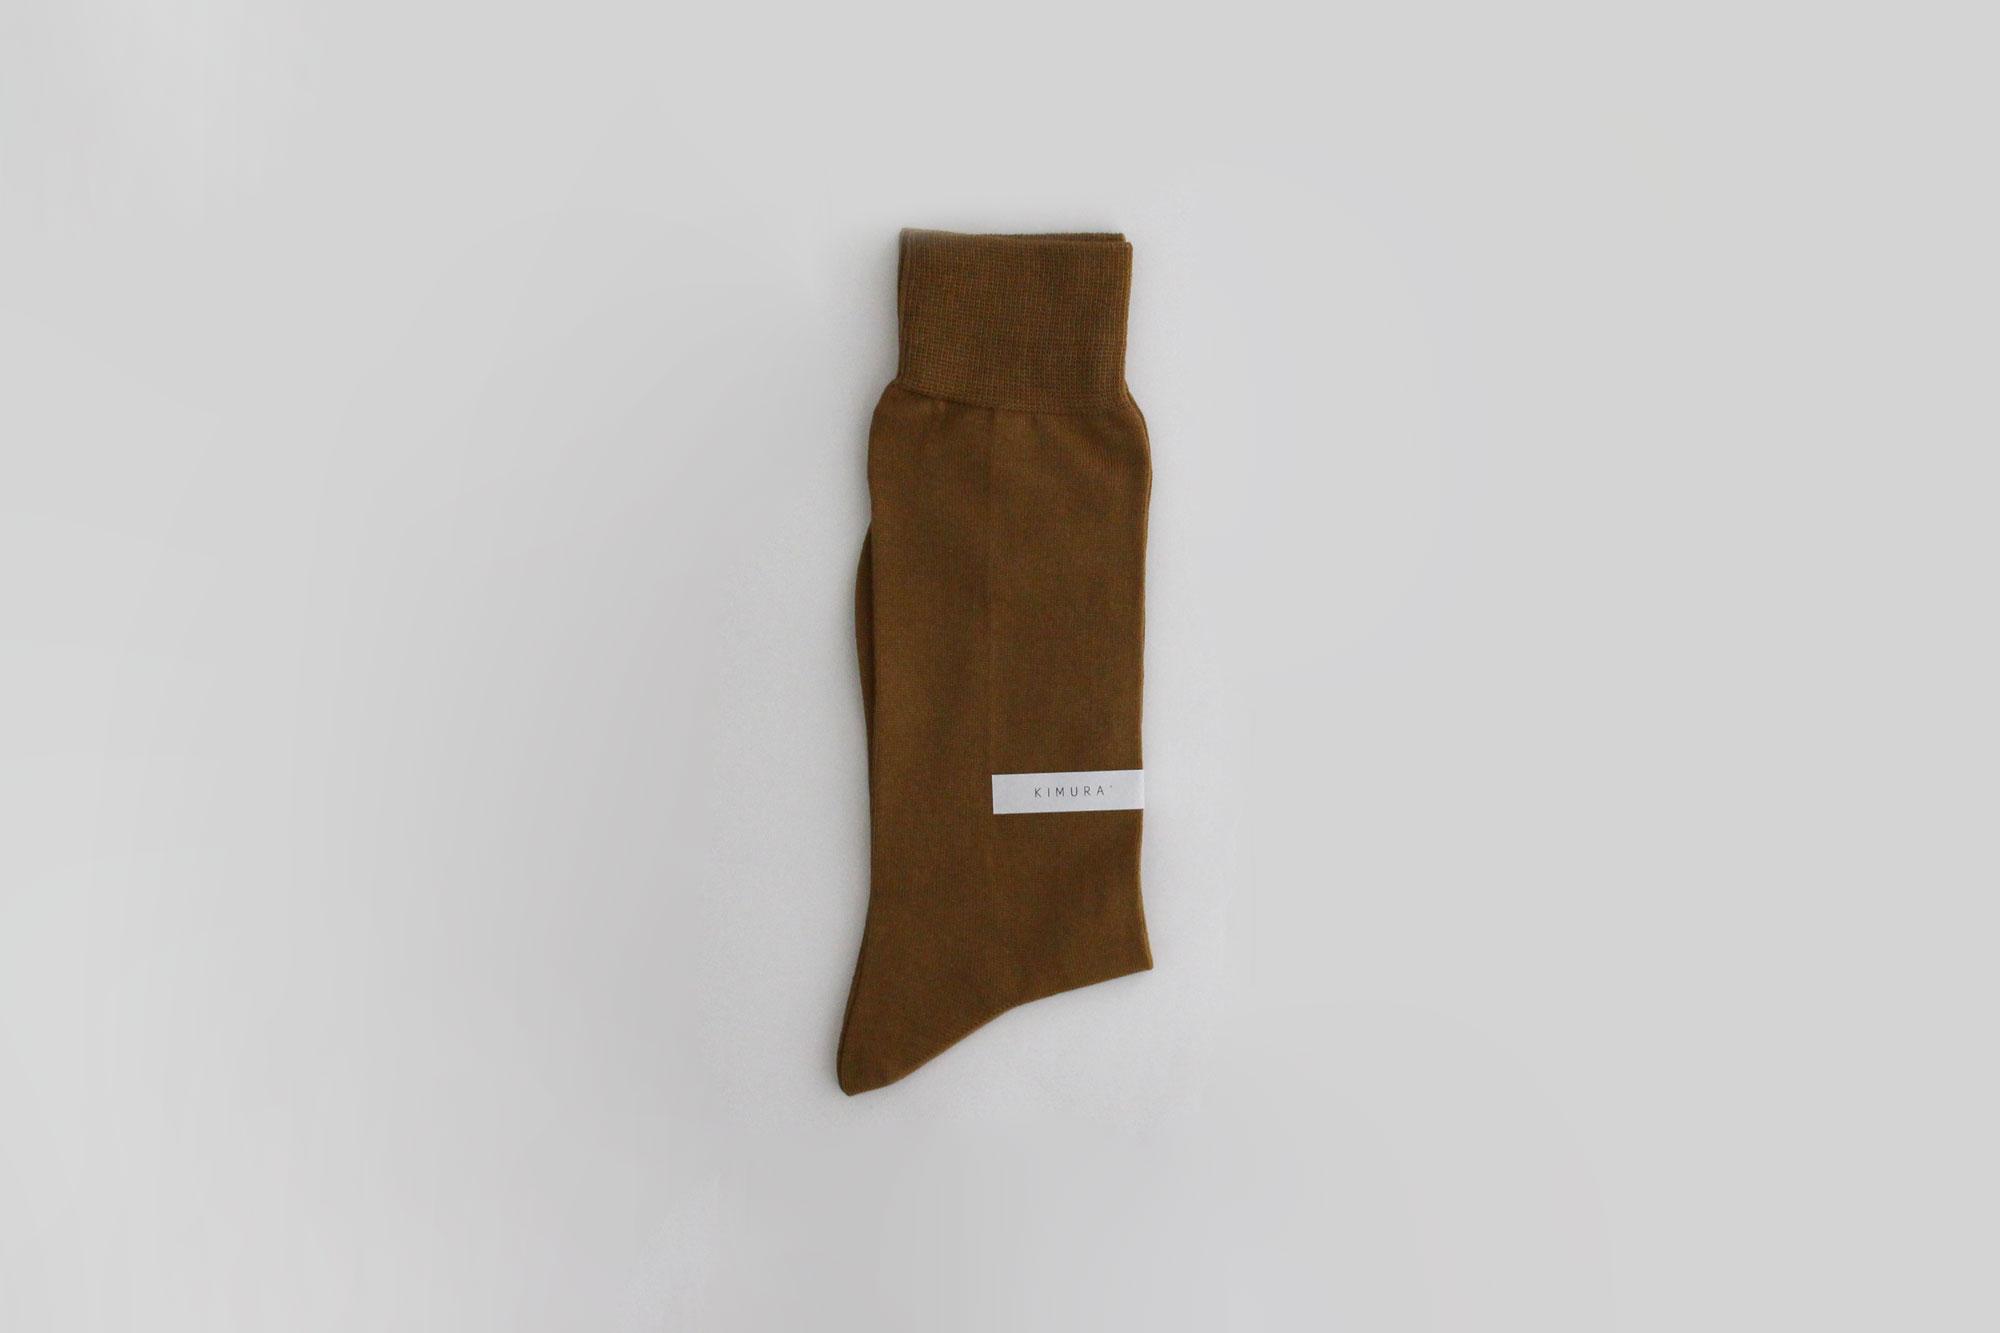 KIMURA` コットンソックス(エジプトシャンコットン) 22-24cm